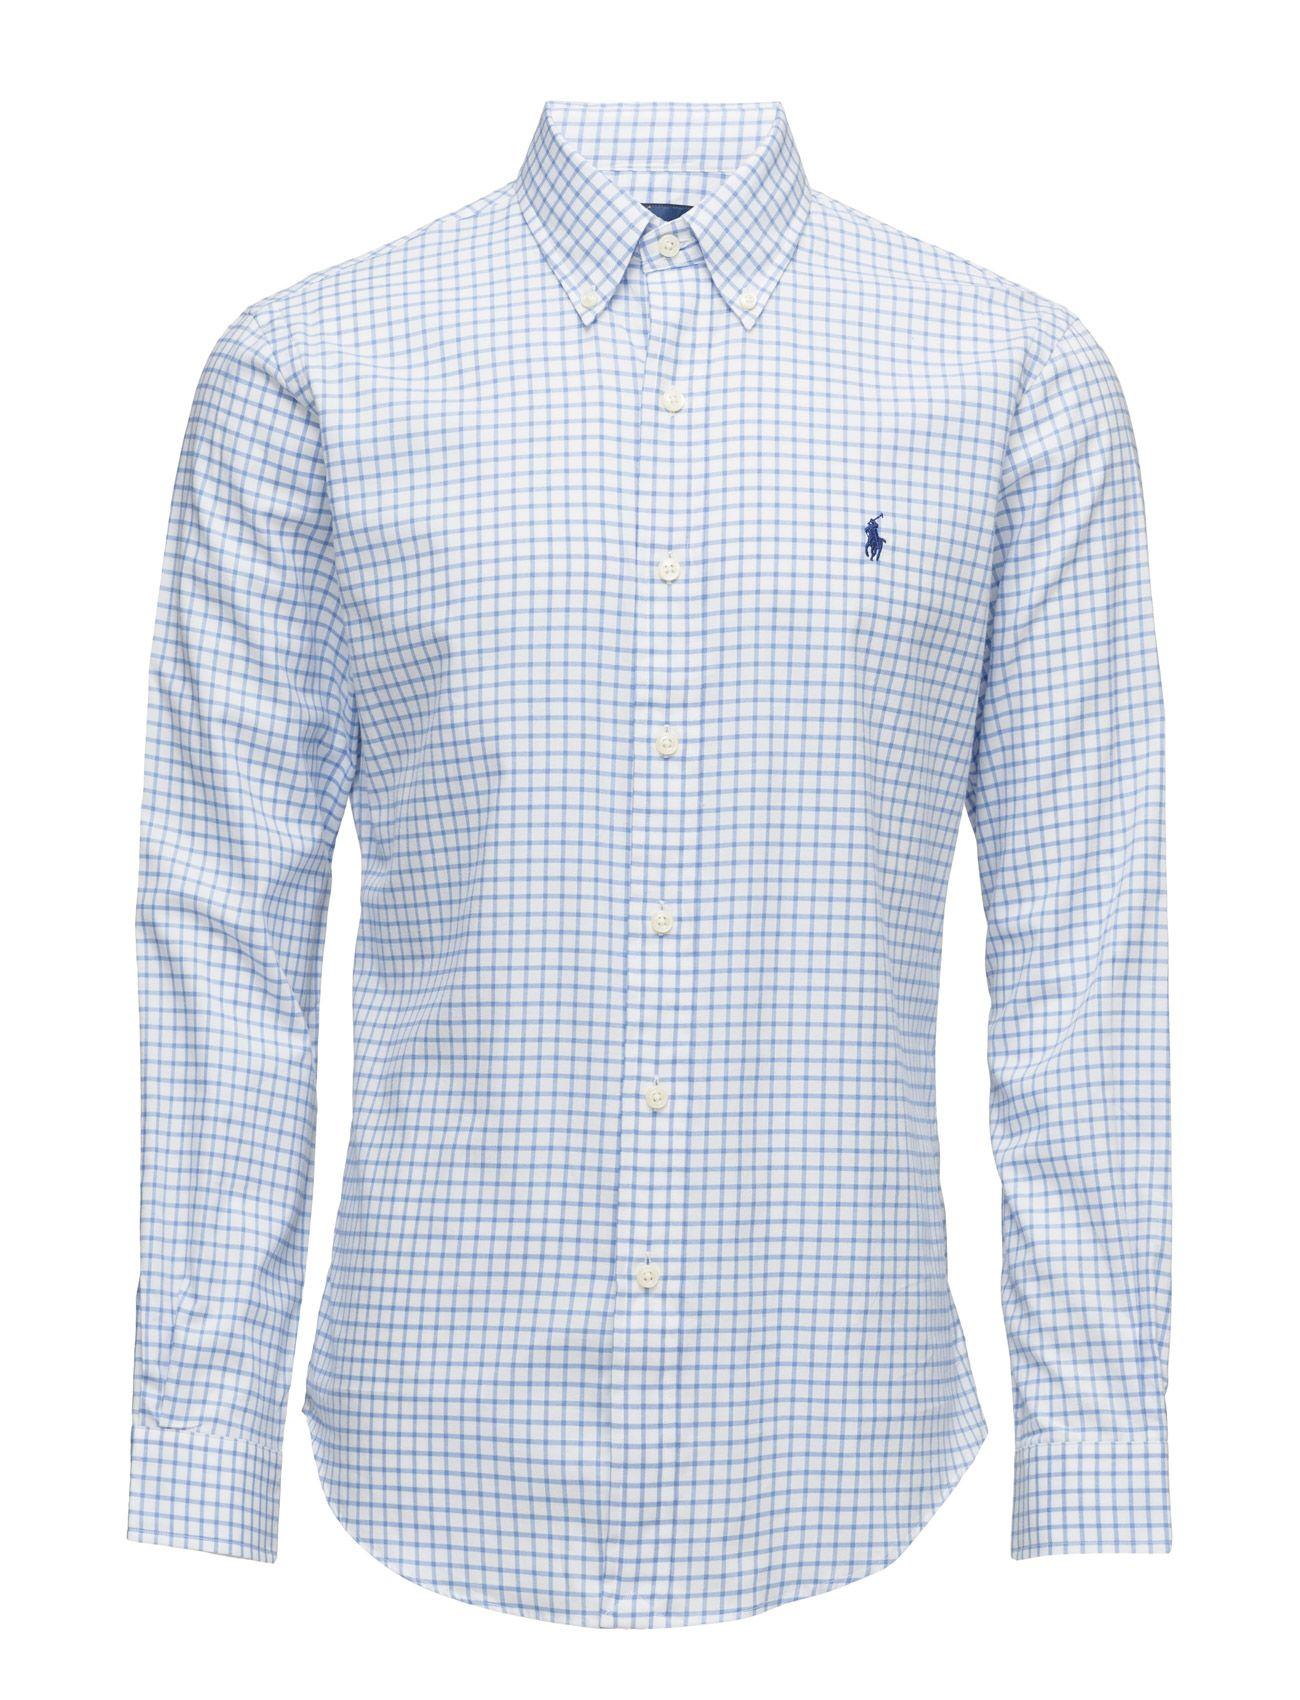 7db98d7233ee polo ralph lauren slim fit cotton twill shirt 1982c blue white men tops  shirts casual